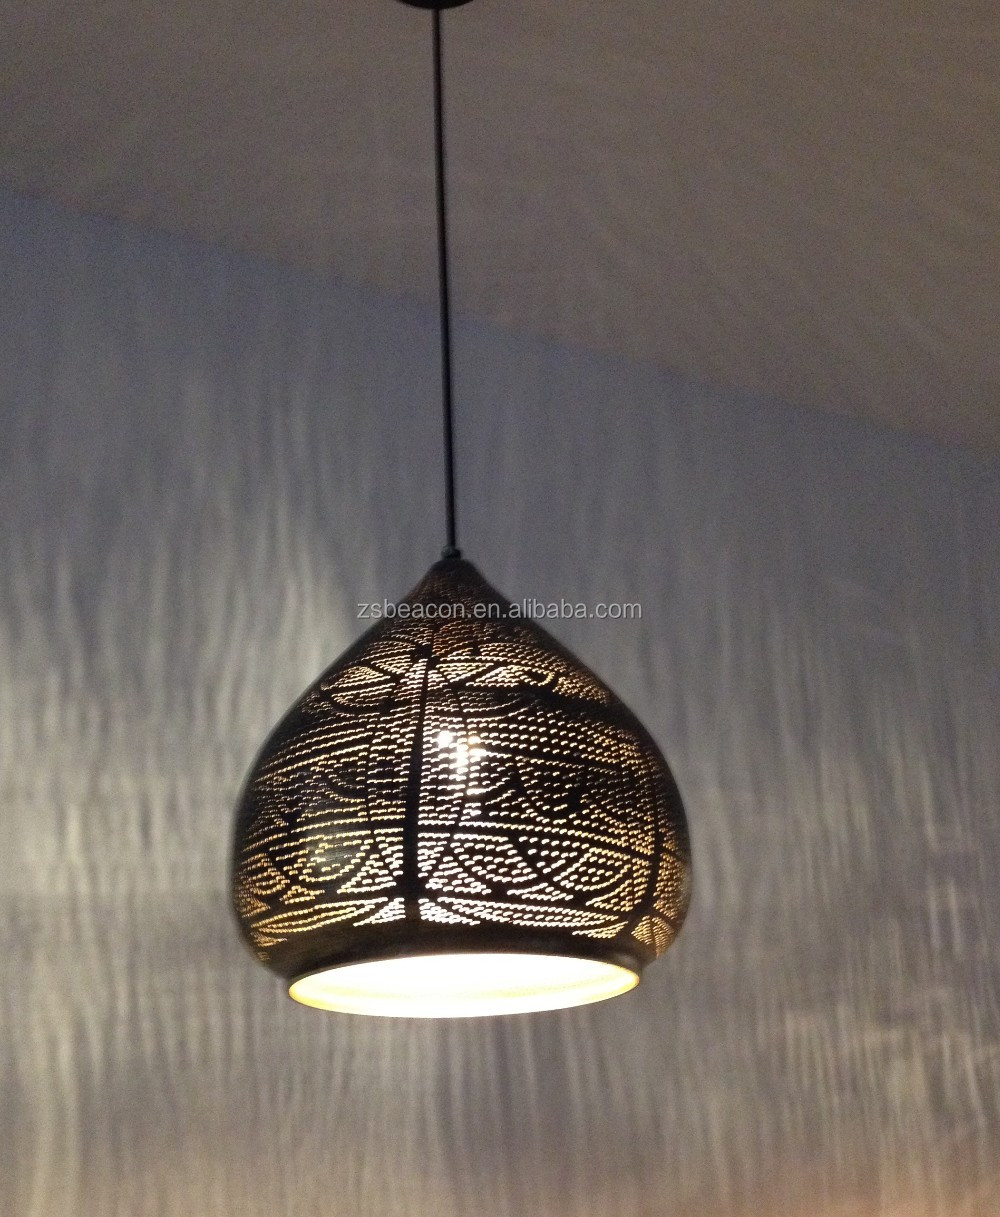 Hanging Light Fittings Wholesale: 2016 Hot Sale New Design Moroccan Lighting Bronze Iron